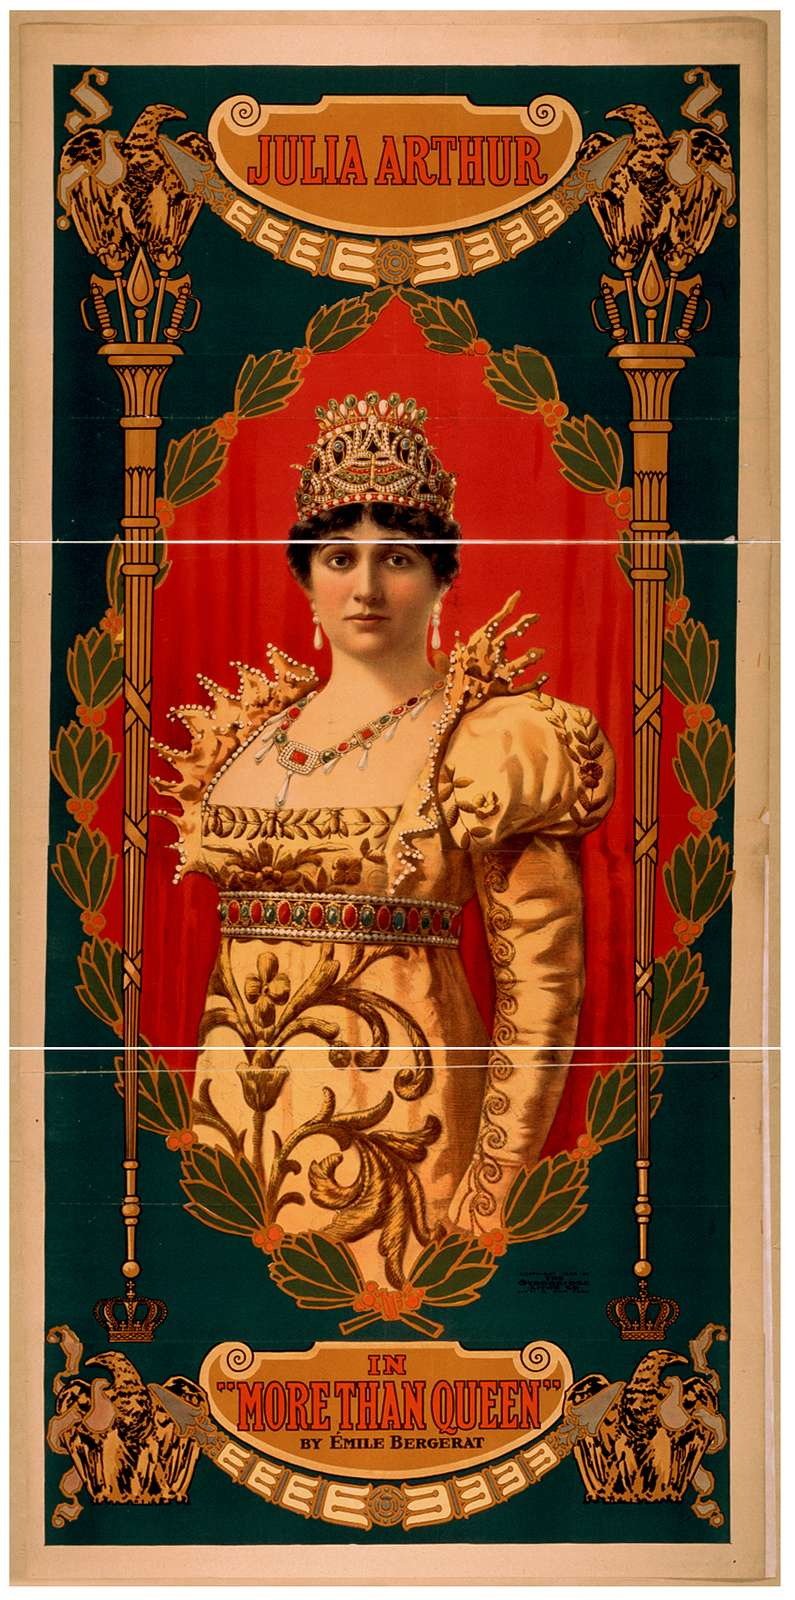 Julia Arthur in More than queen by Émile Bergerat.